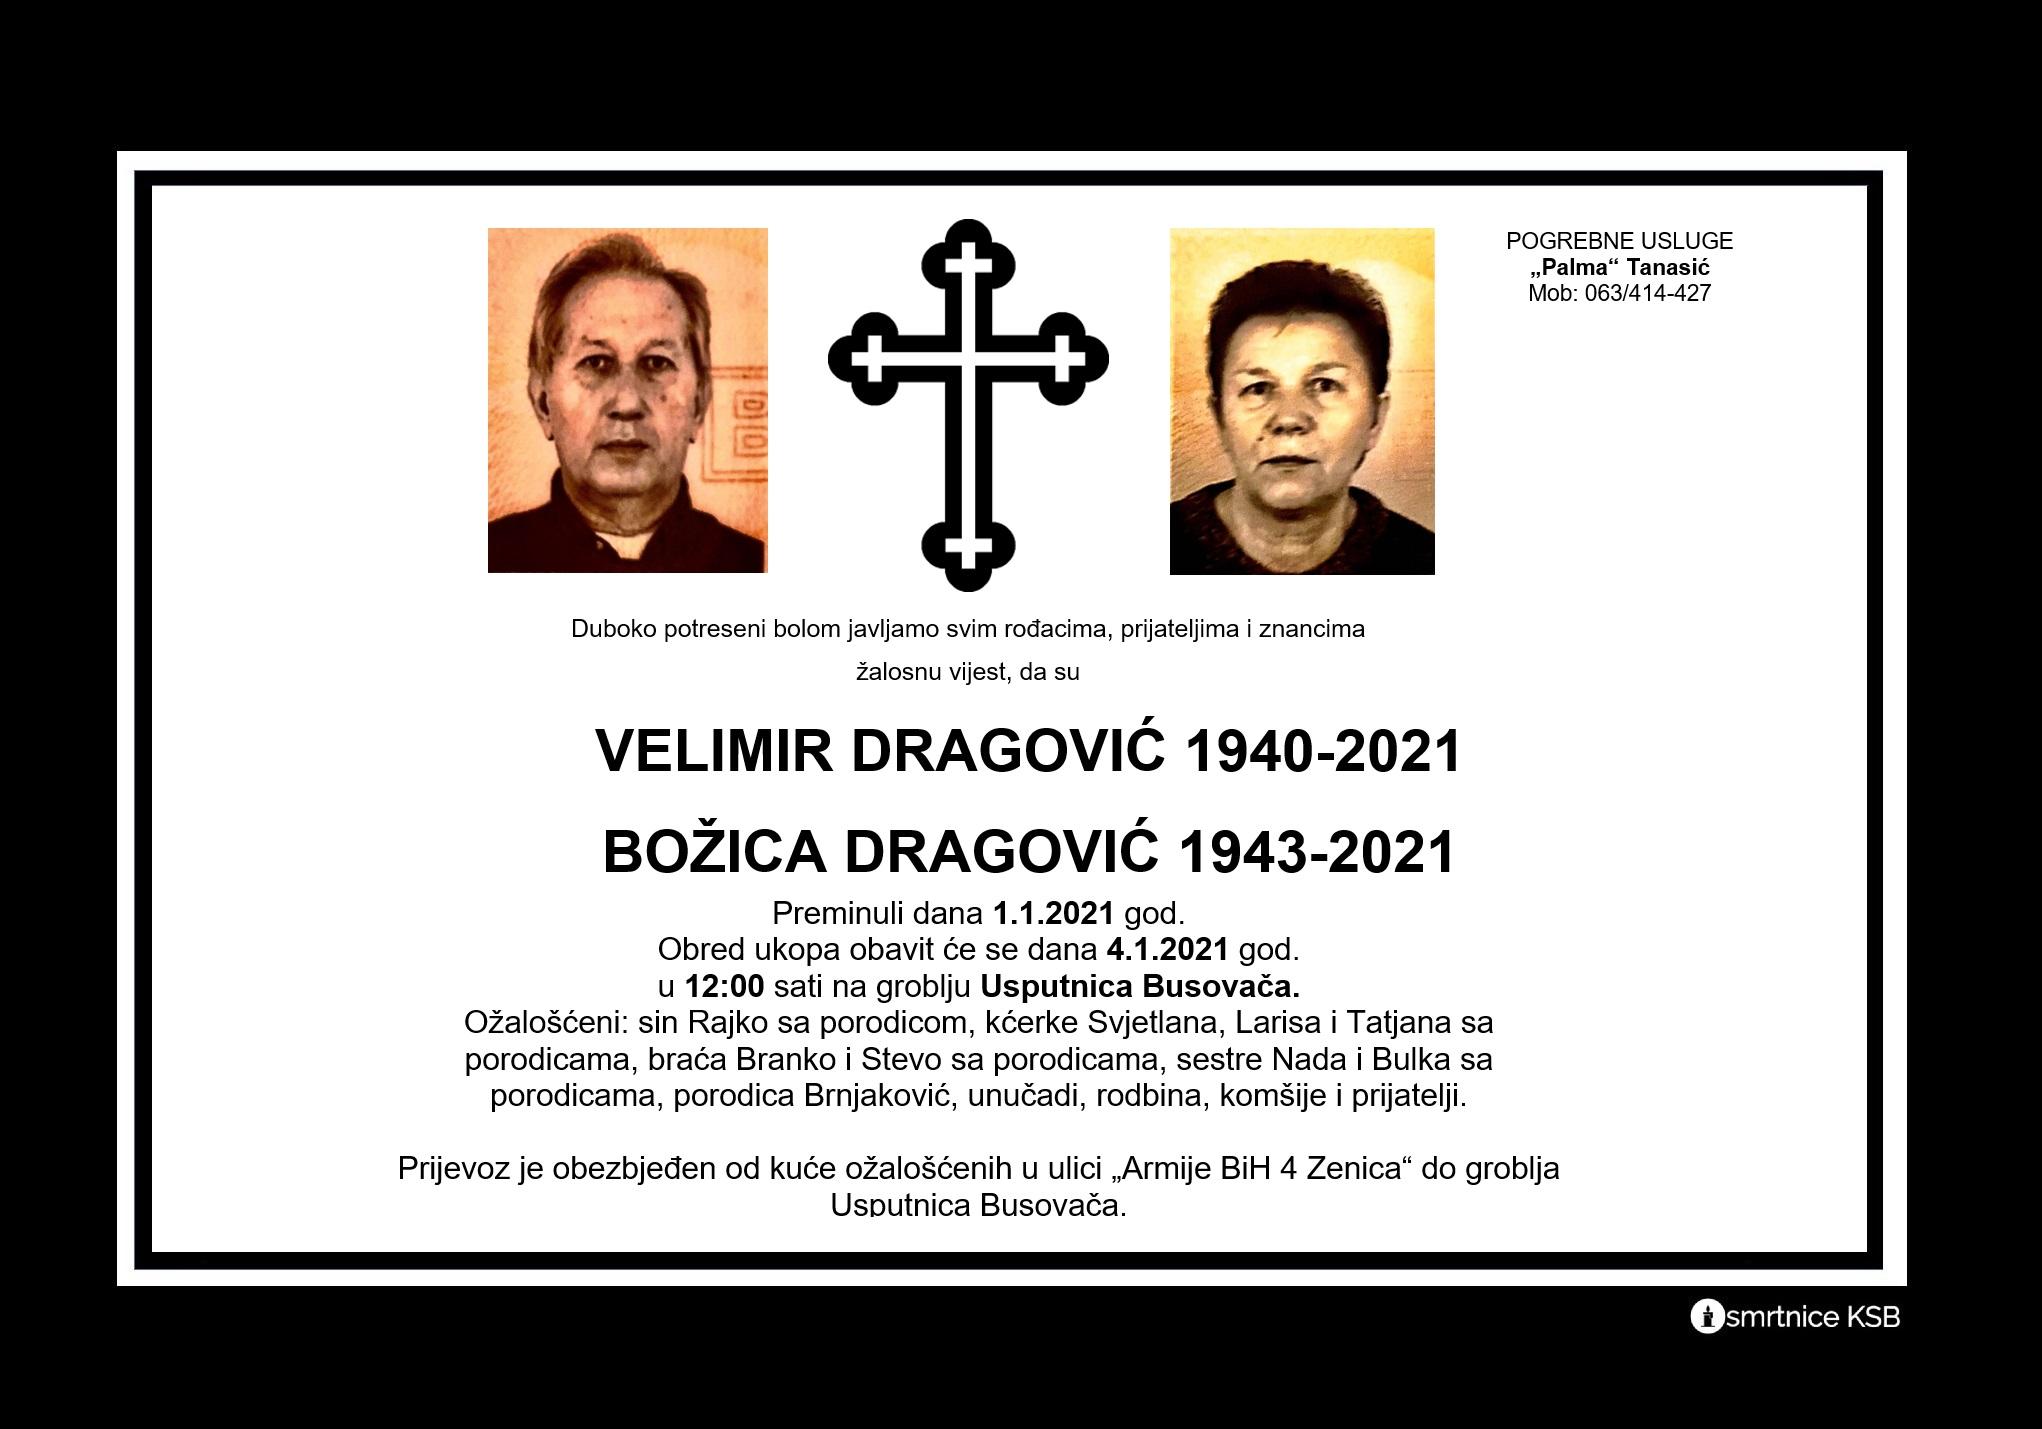 Velimir Dragović i Božica Dragović